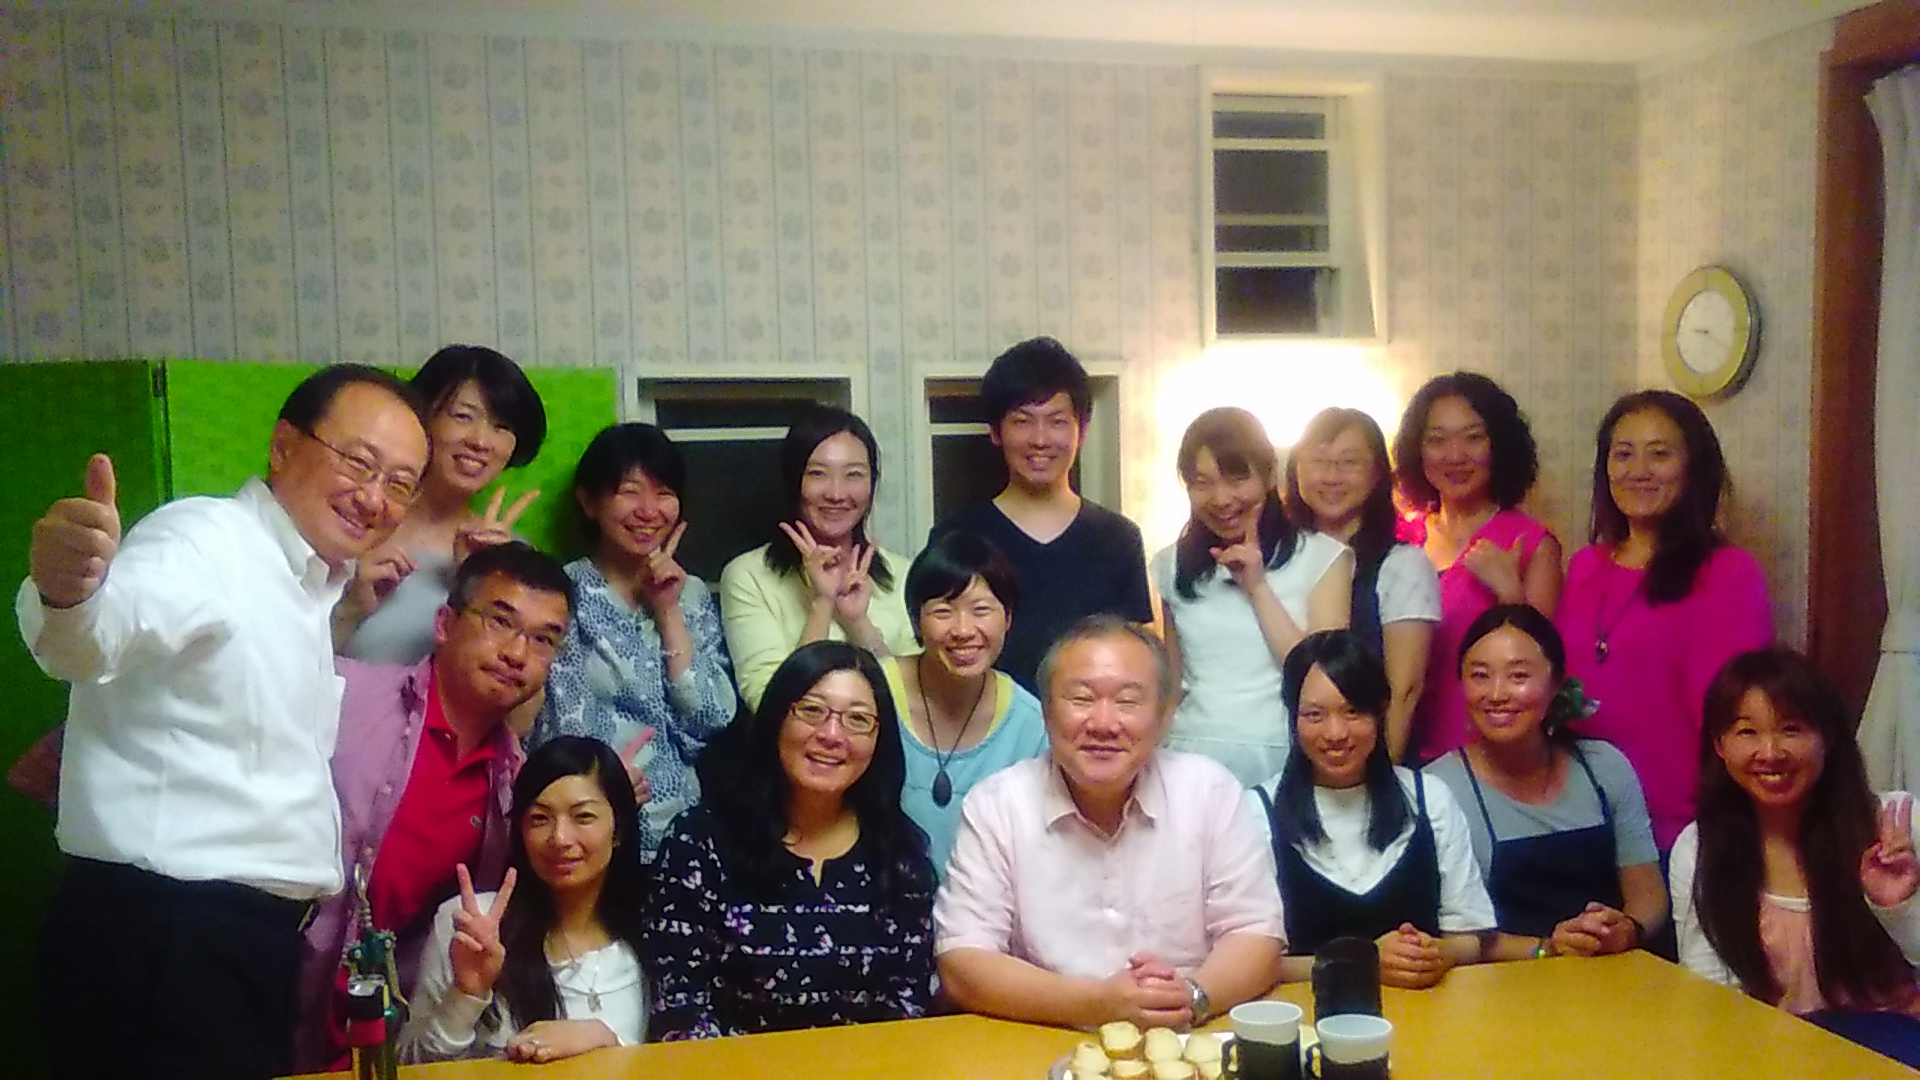 KIMG0505 - 池川明先生の愛の子育て塾第13期生(2018年8月~2018年12月)募集中です。